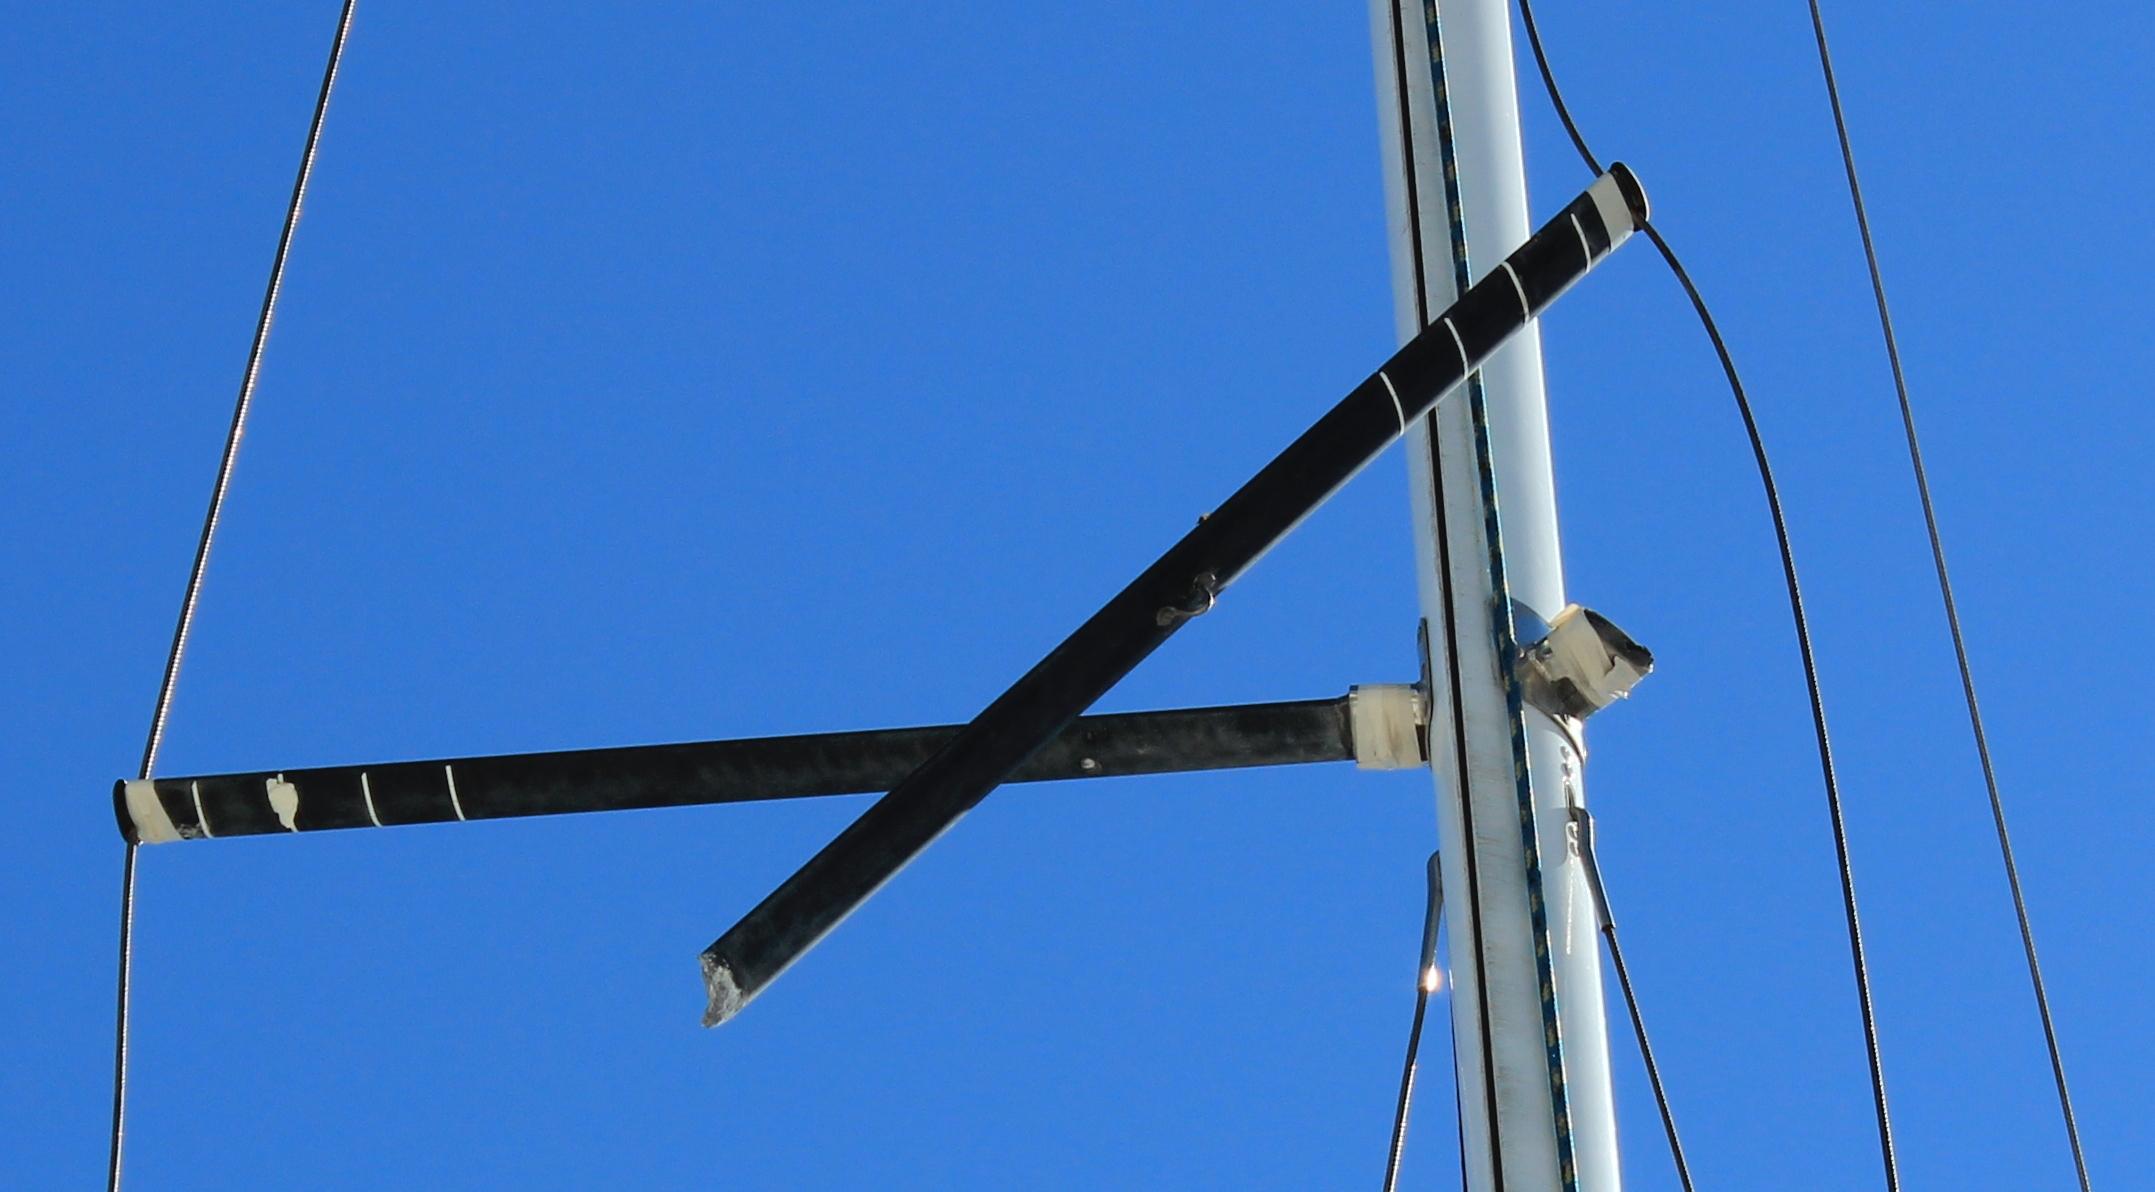 Wiring Diagram Additionally 96 Geo Tracker Wiring Diagram Additionally